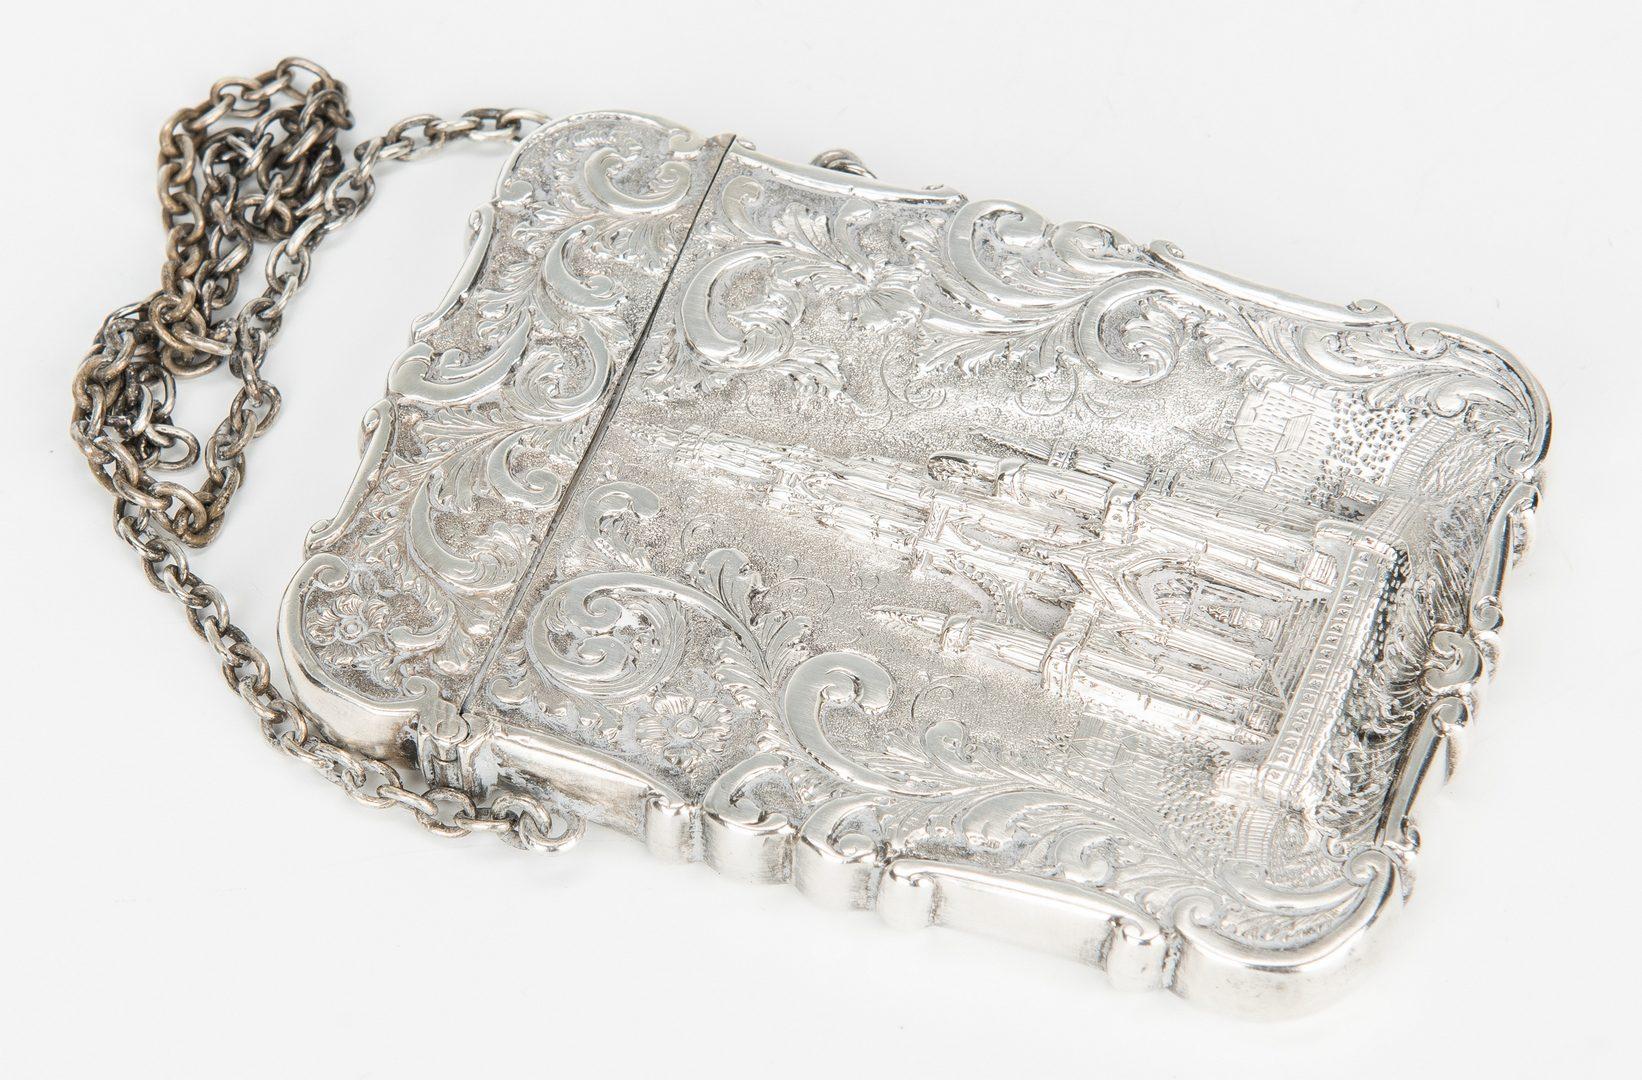 Lot 643: 4 Silver Card Cases & Match Safes